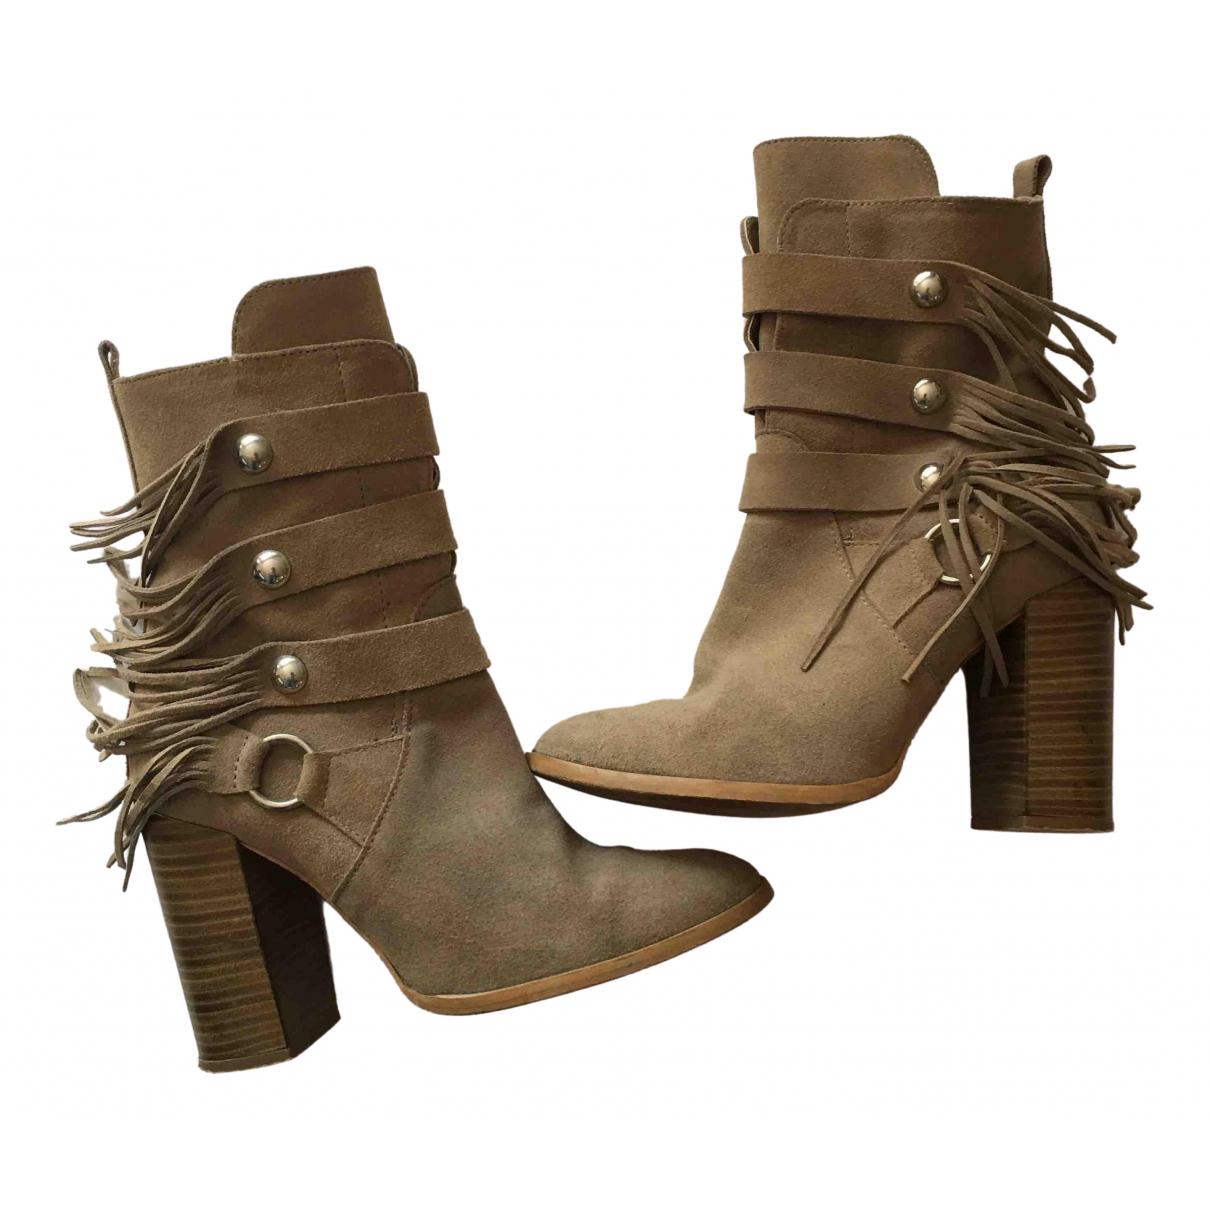 Zara \N Suede Boots for Women 5 UK